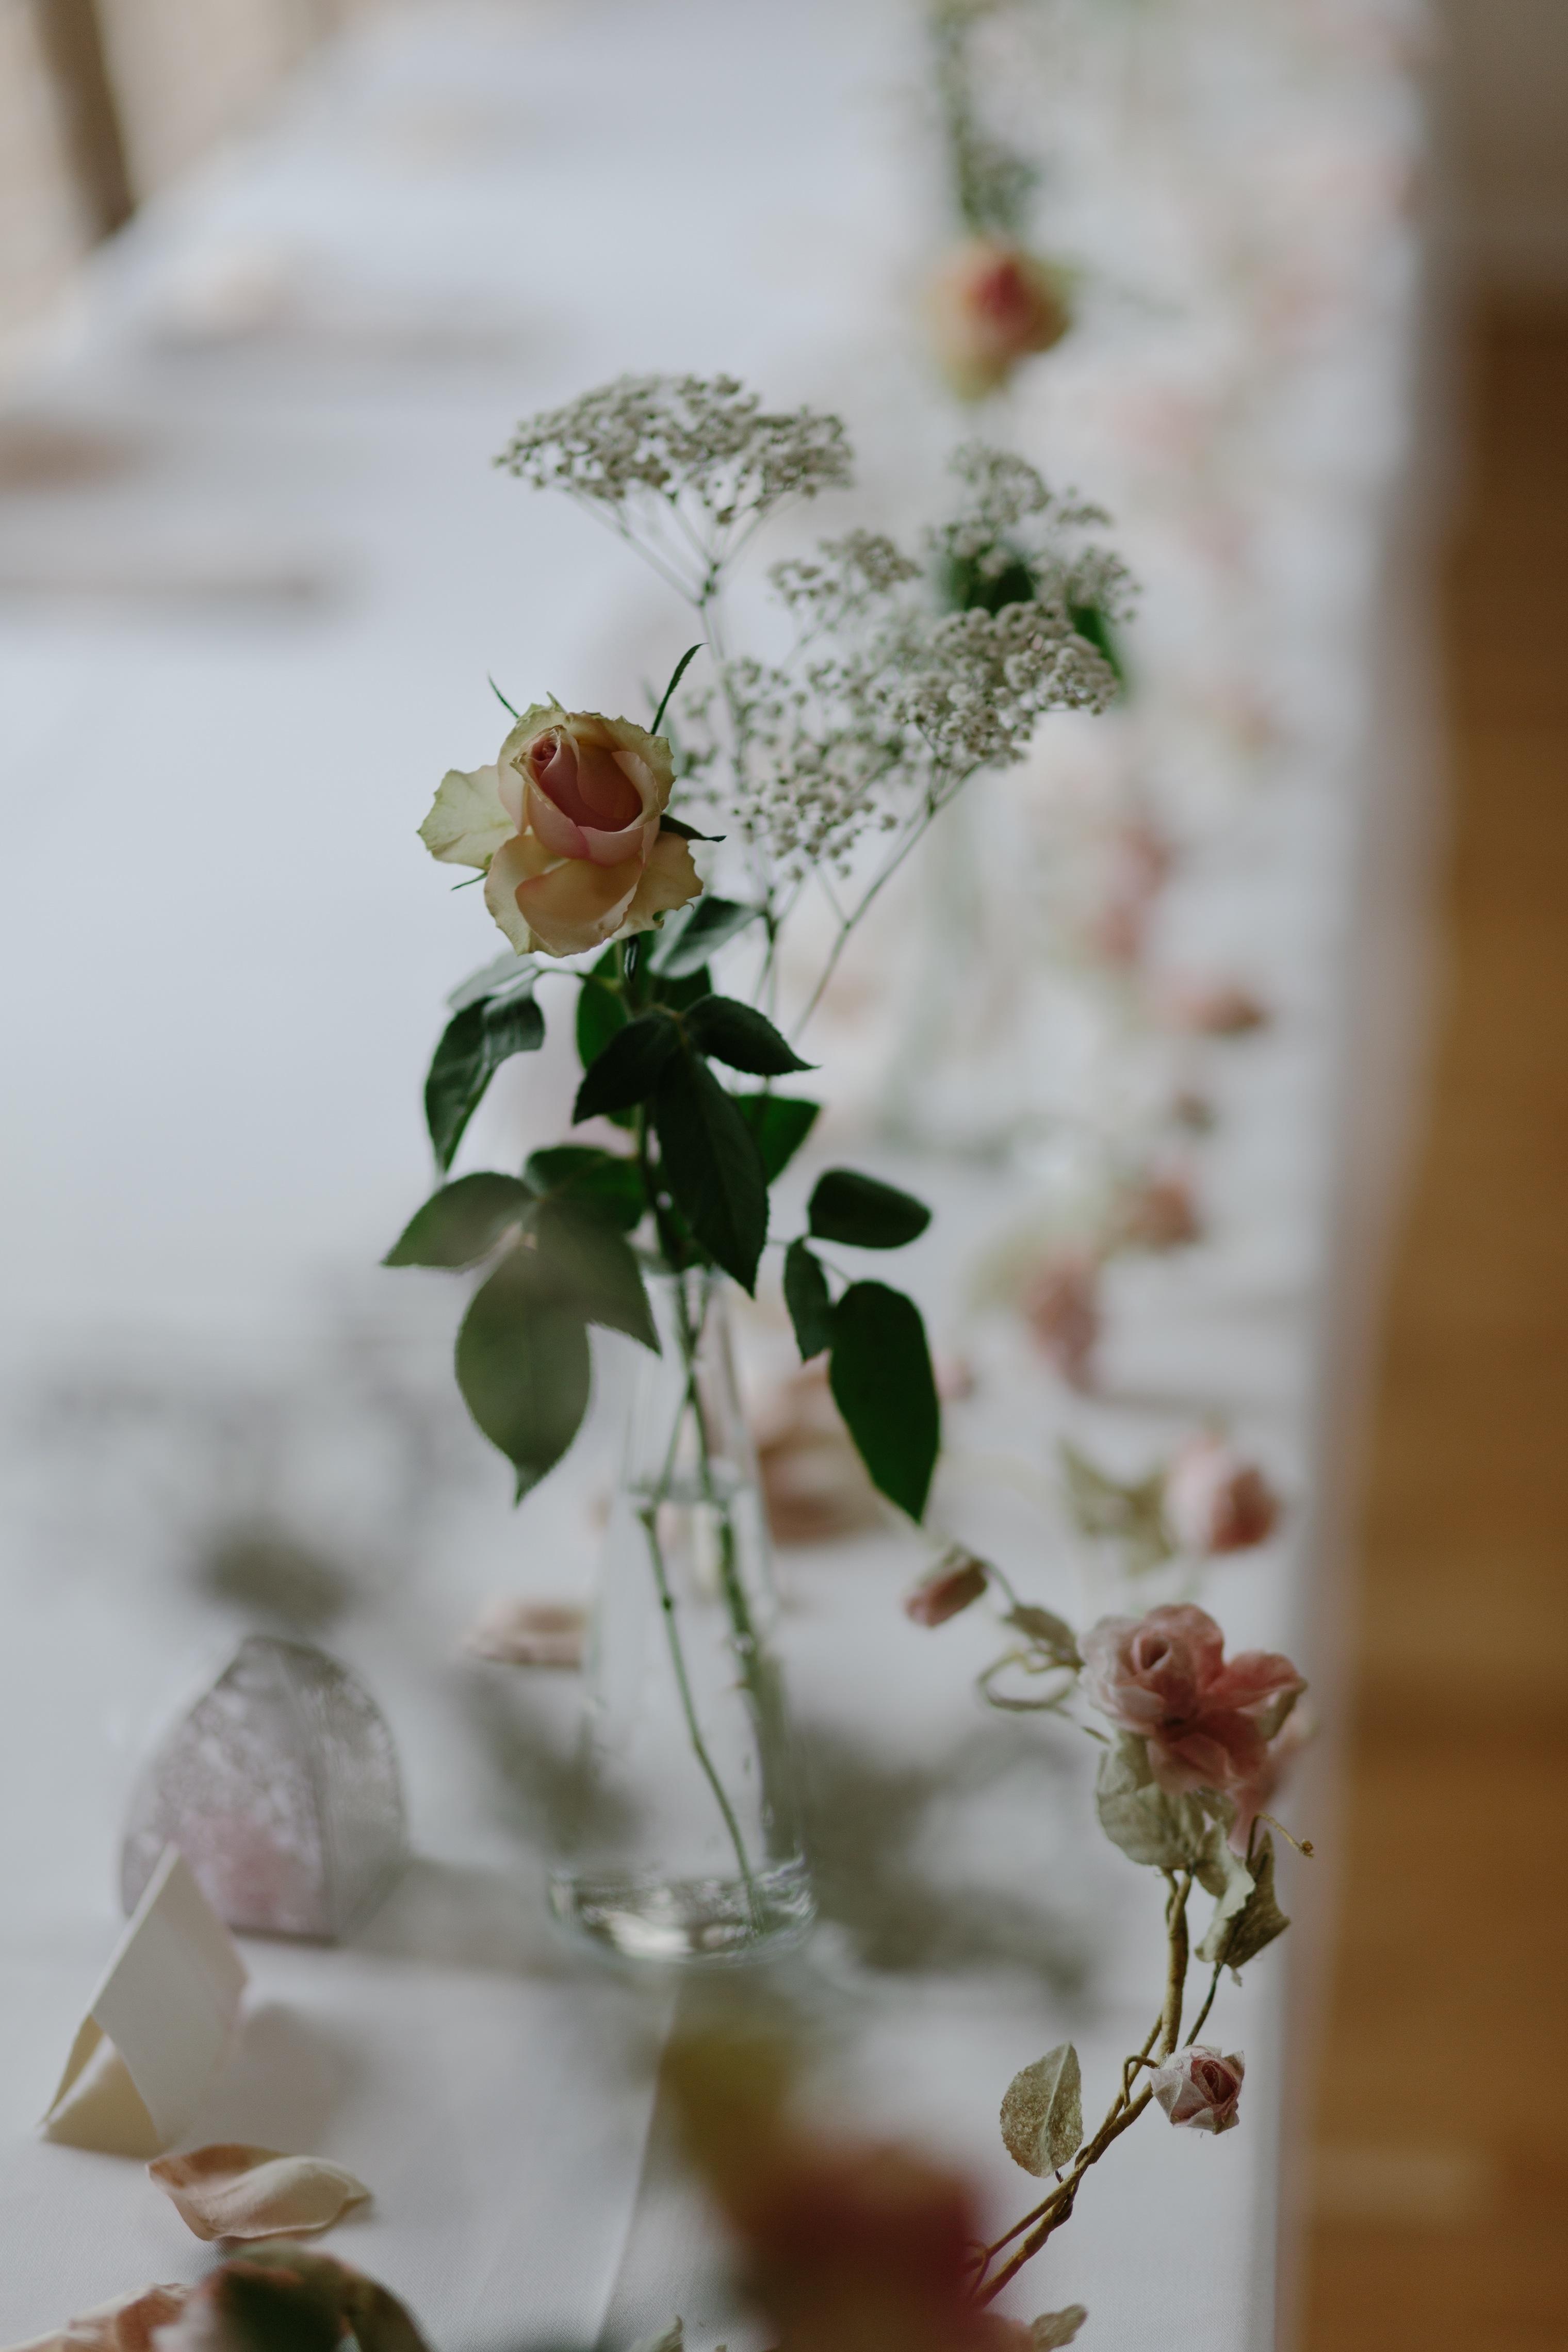 Ava rose hamilton bride rustic homespun wedding at natural retreats flowers in bud vases for wedding table decor reviewsmspy